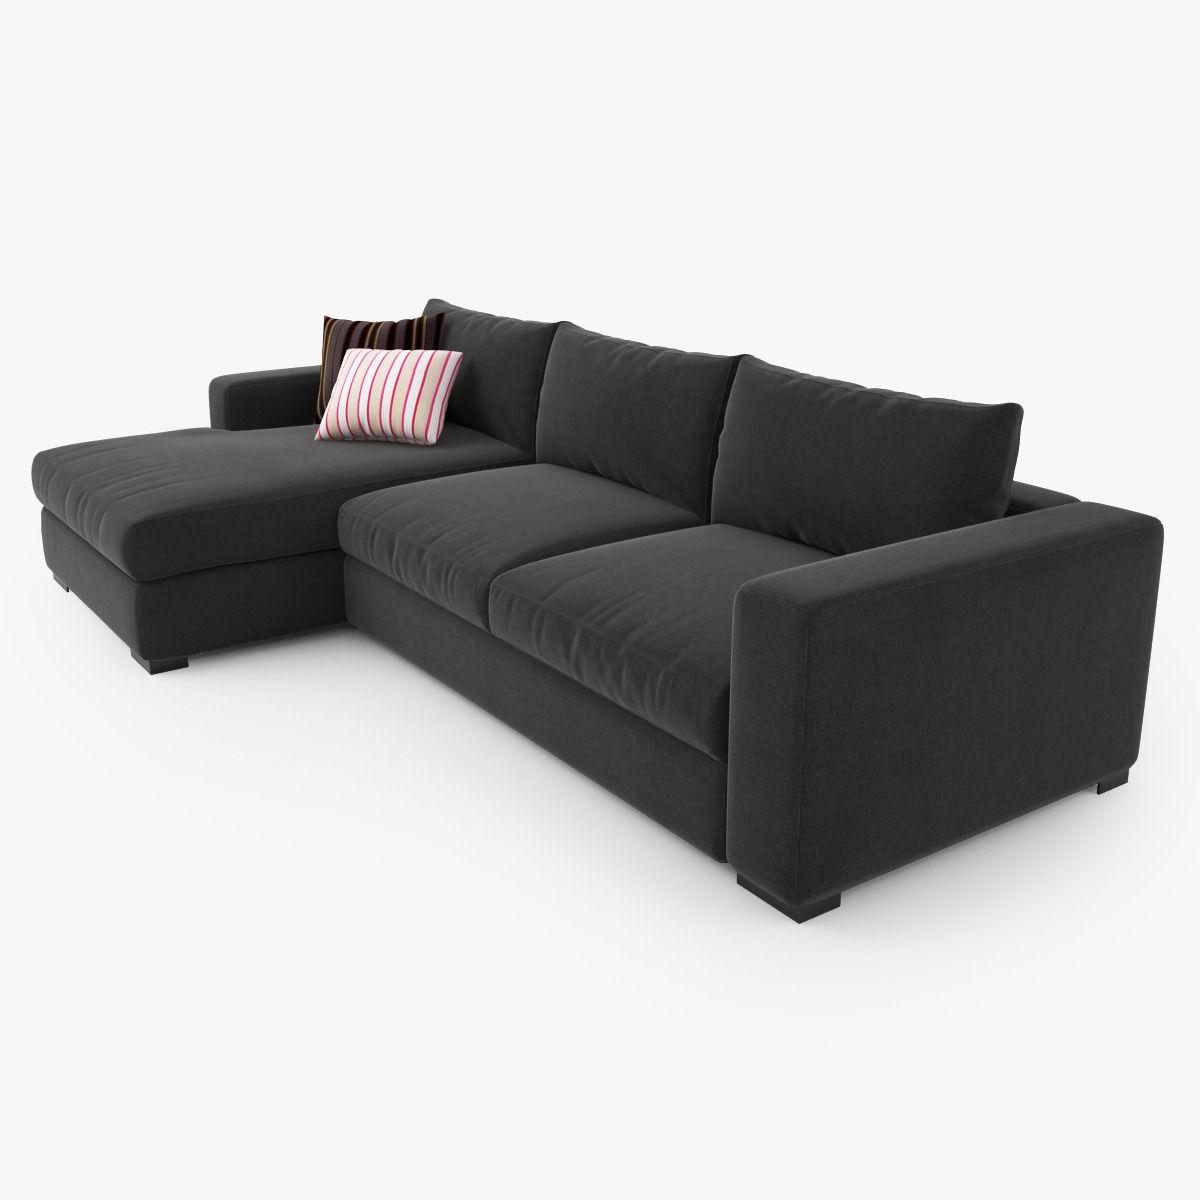 Marvelous Boconcept Soffa Boconcept Soffa Bubble Large Seat Sofa Cjindustries Chair Design For Home Cjindustriesco